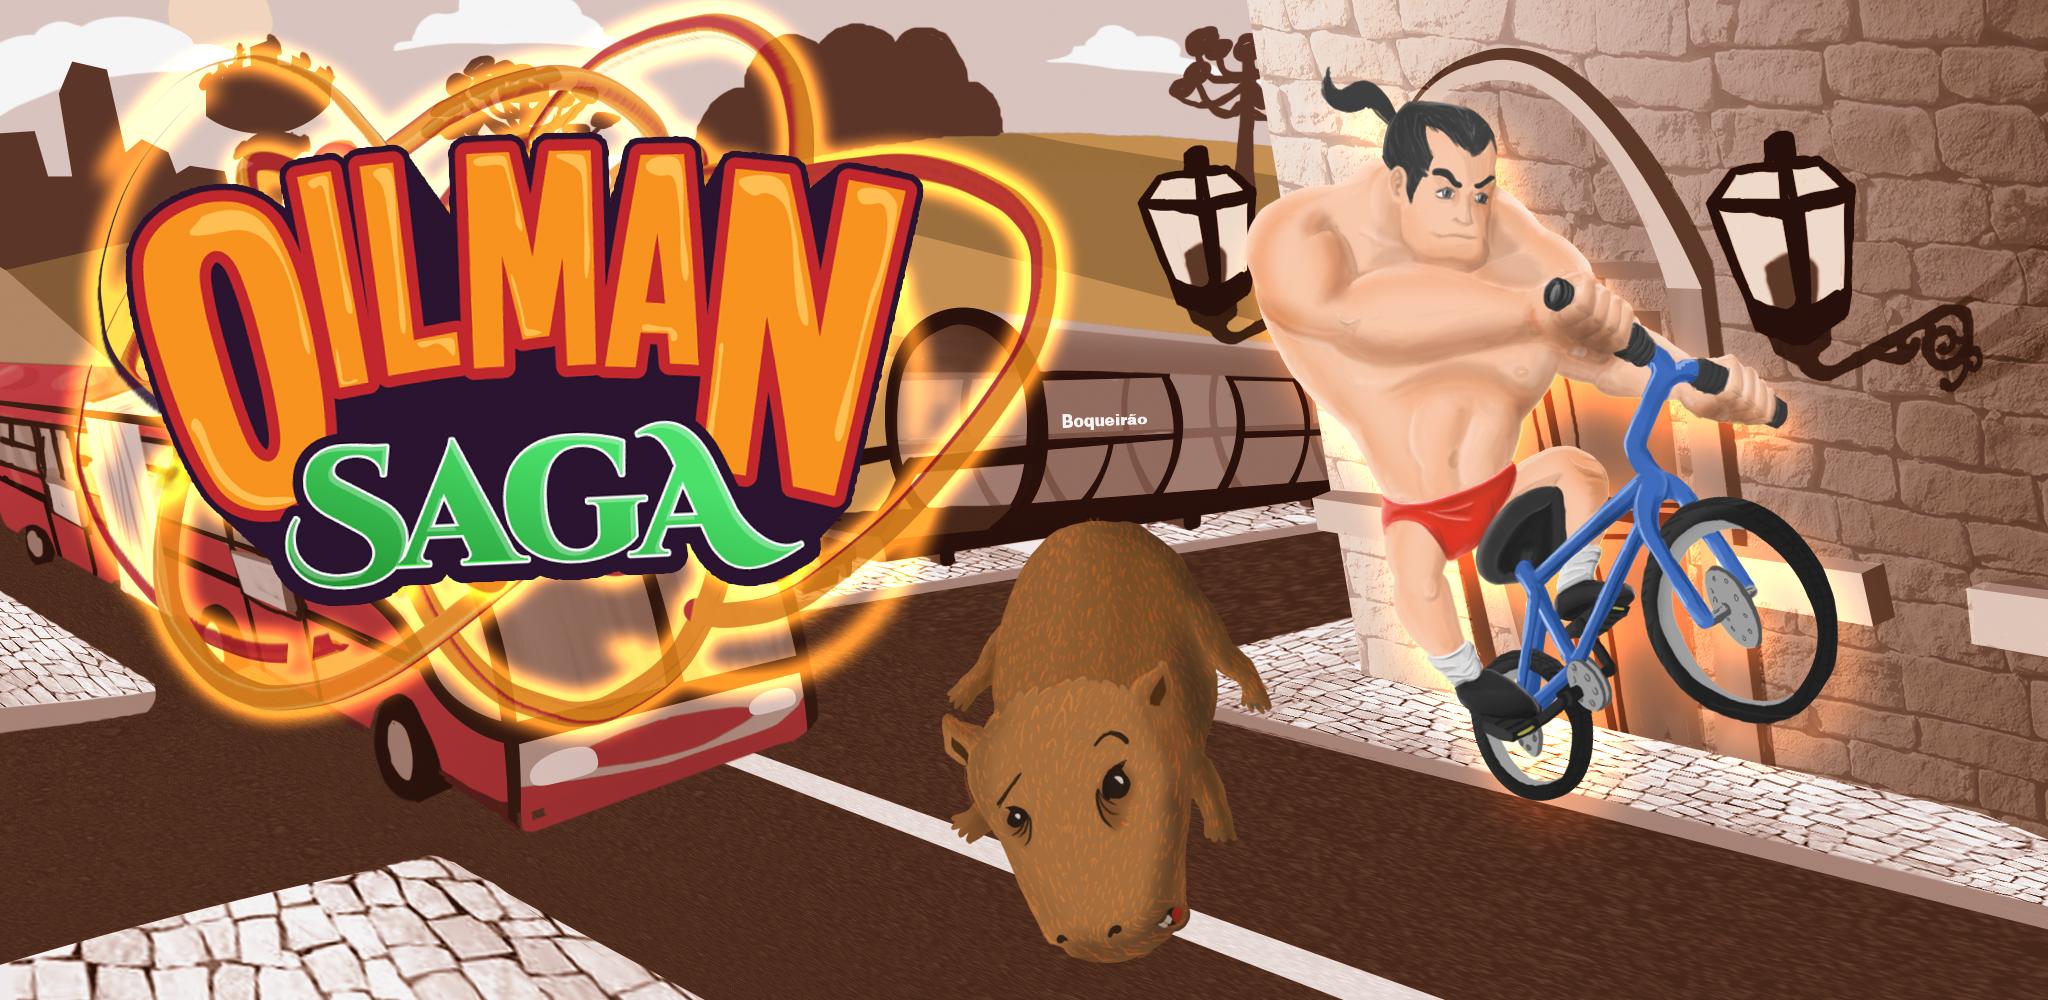 Oilman Saga - Game